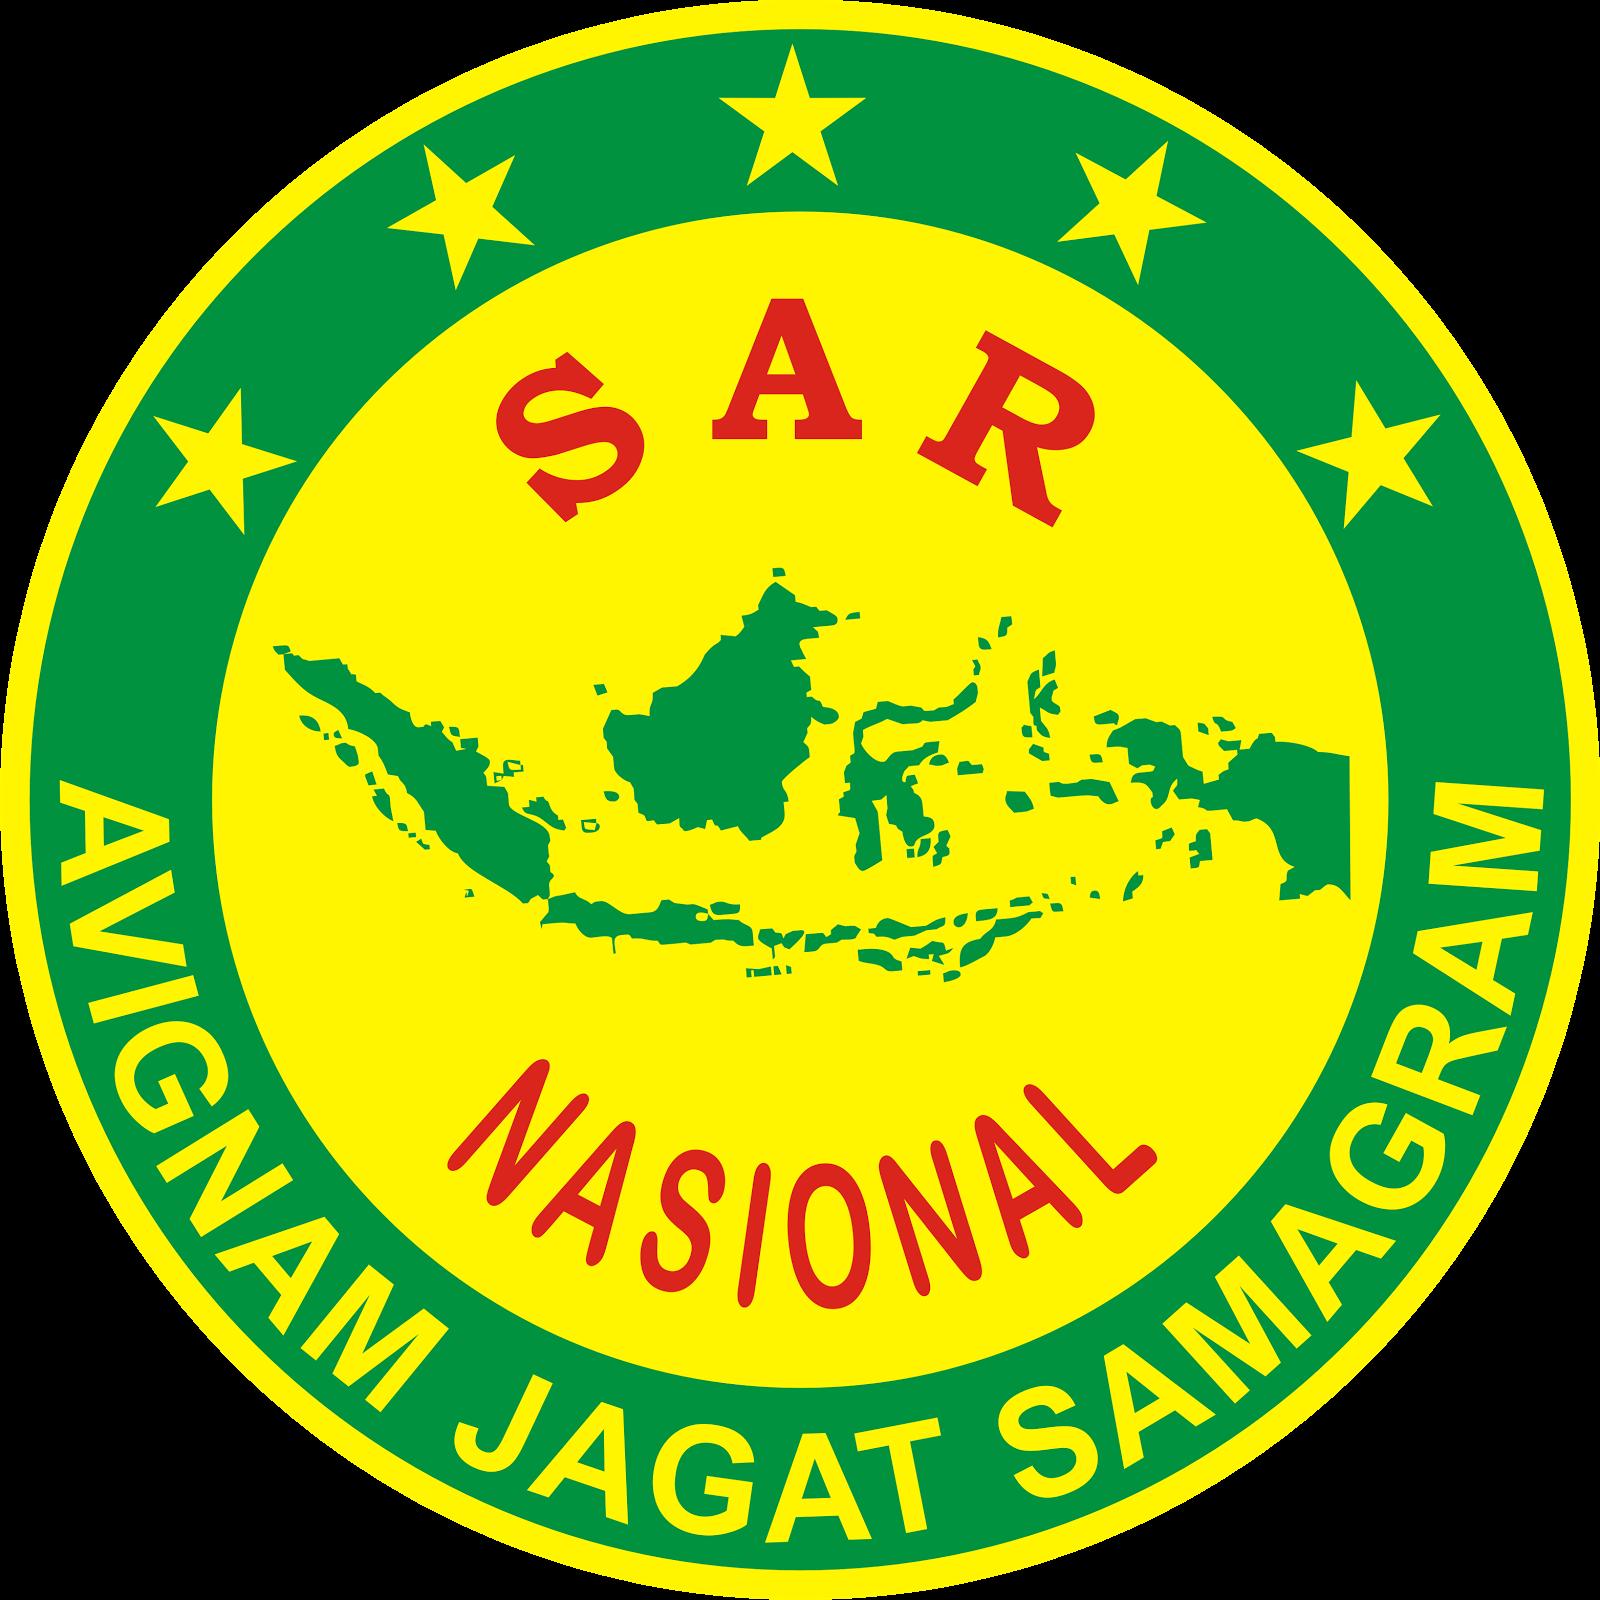 Logo Badan SAR Nasional - Kumpulan Logo Indonesia